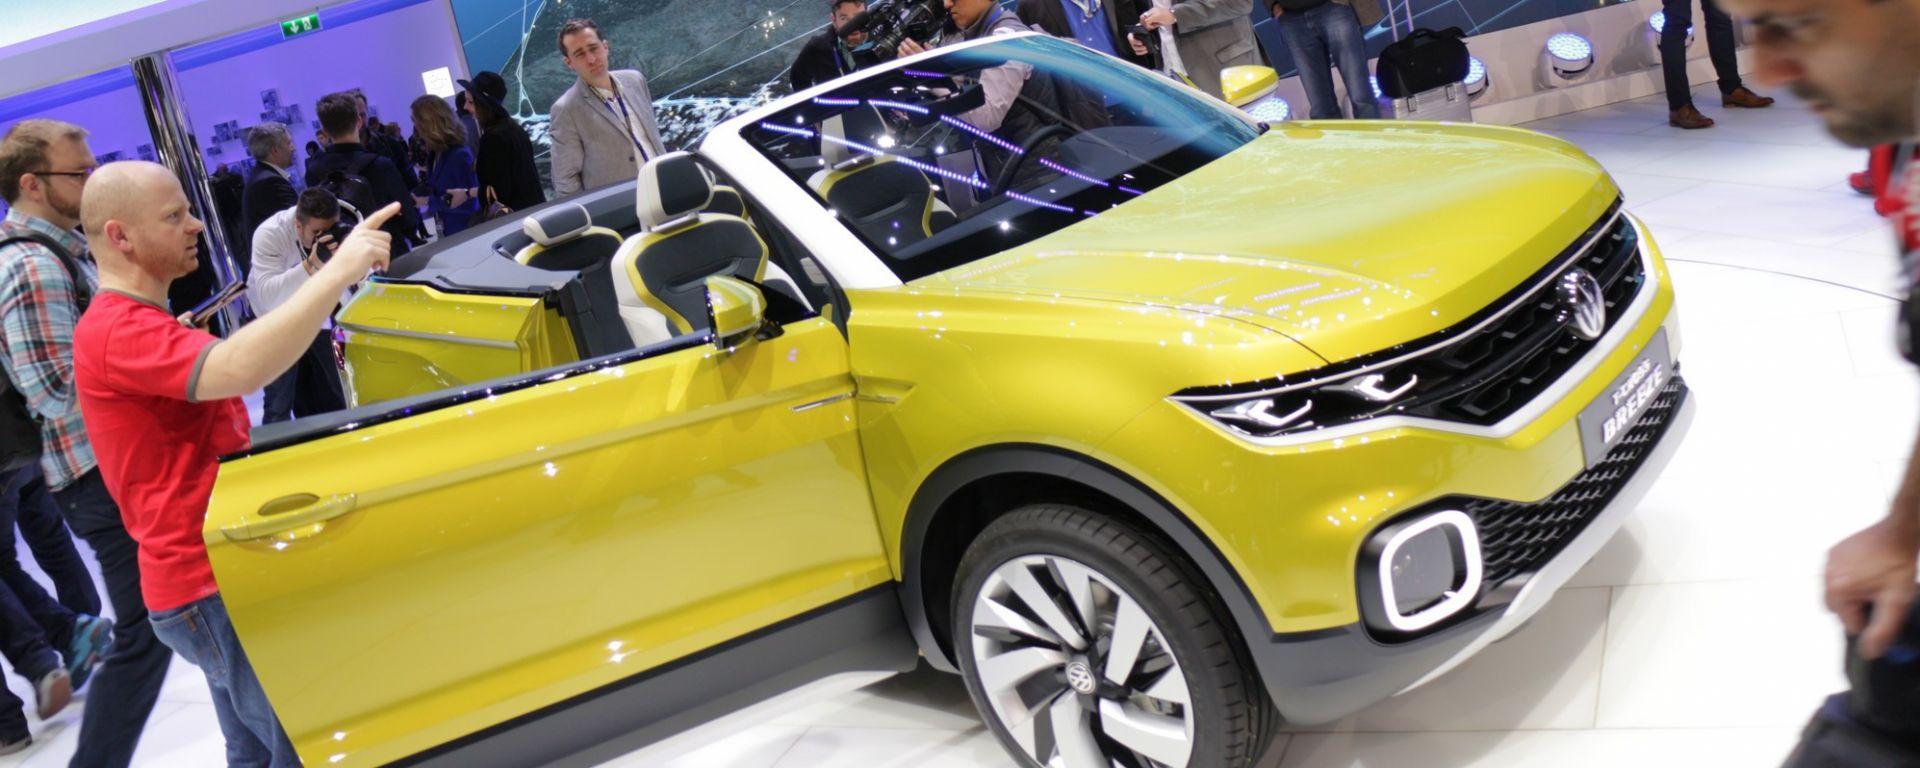 Ginevra 2016: le novità Volkswagen